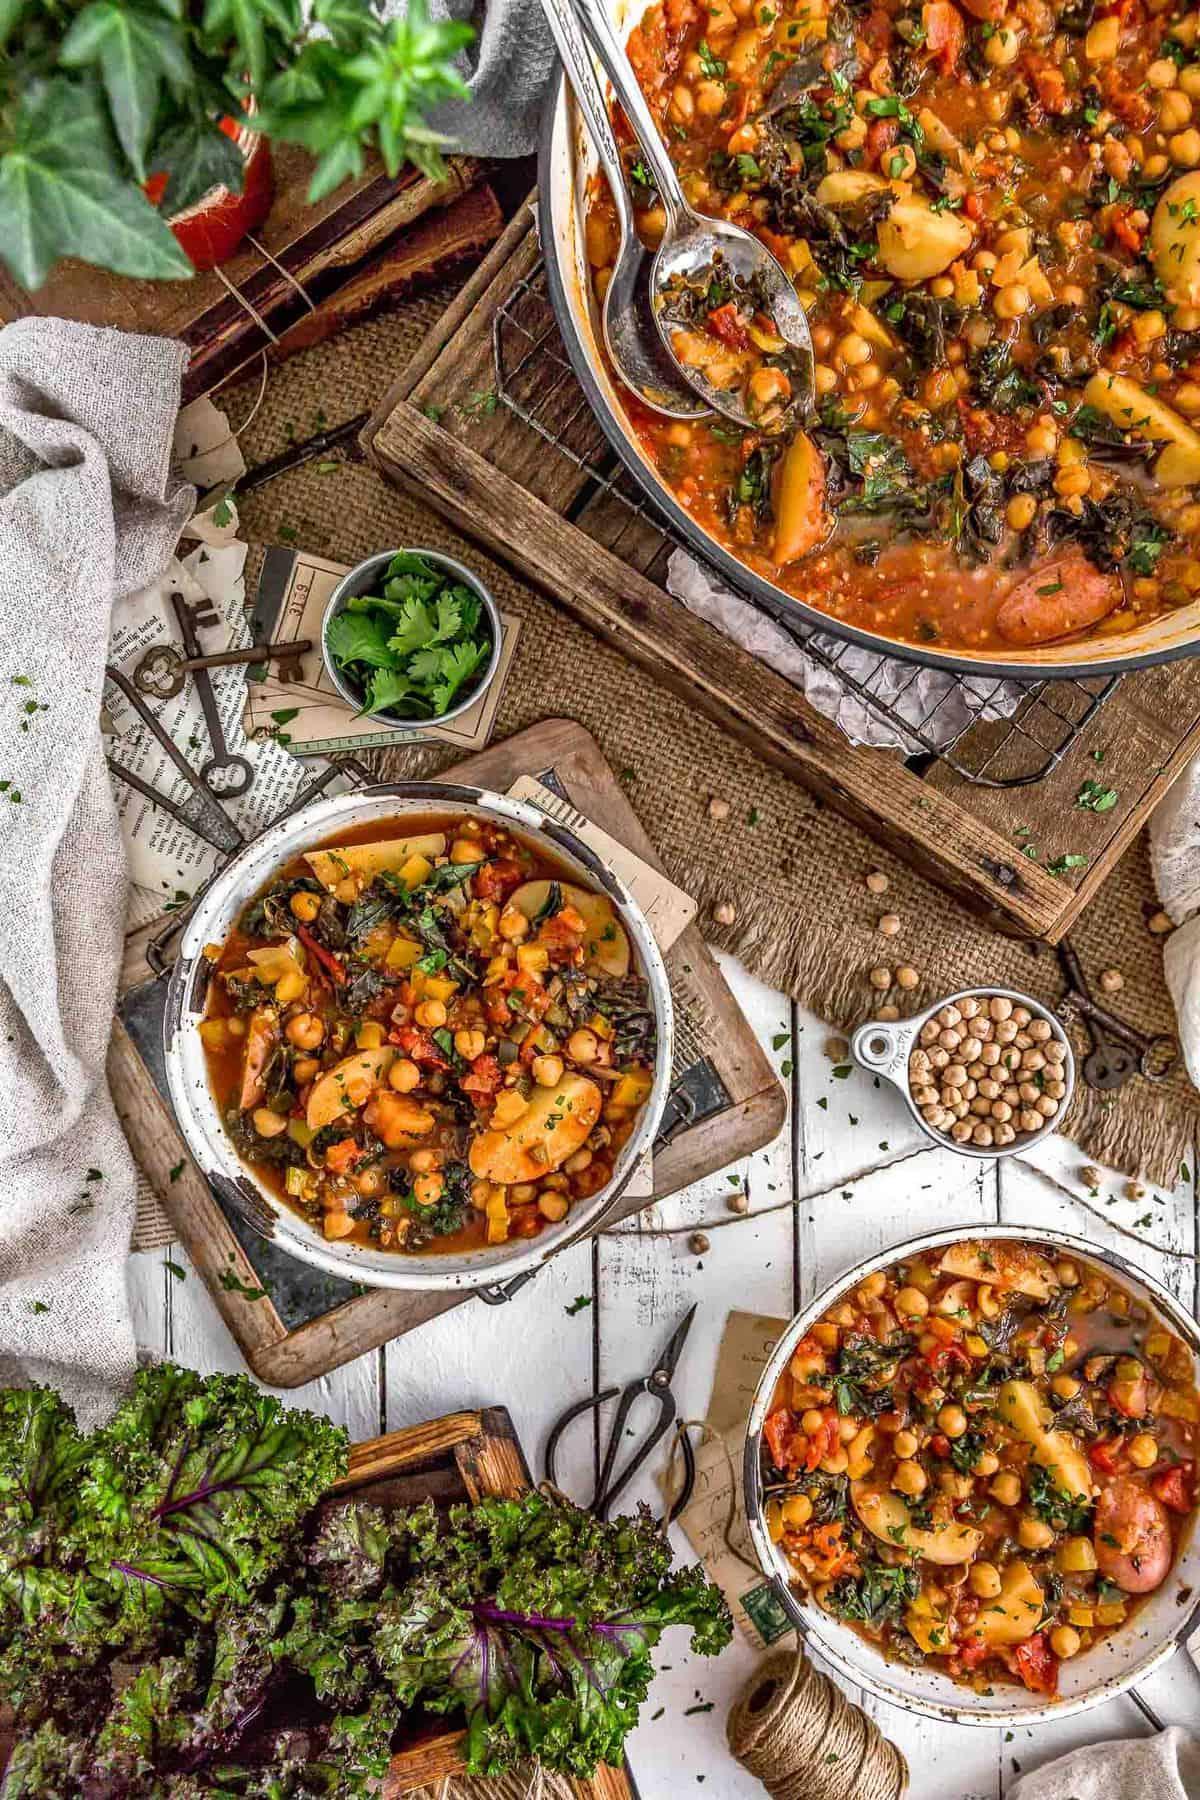 Tablescape of Spiced Kale Potato Stew